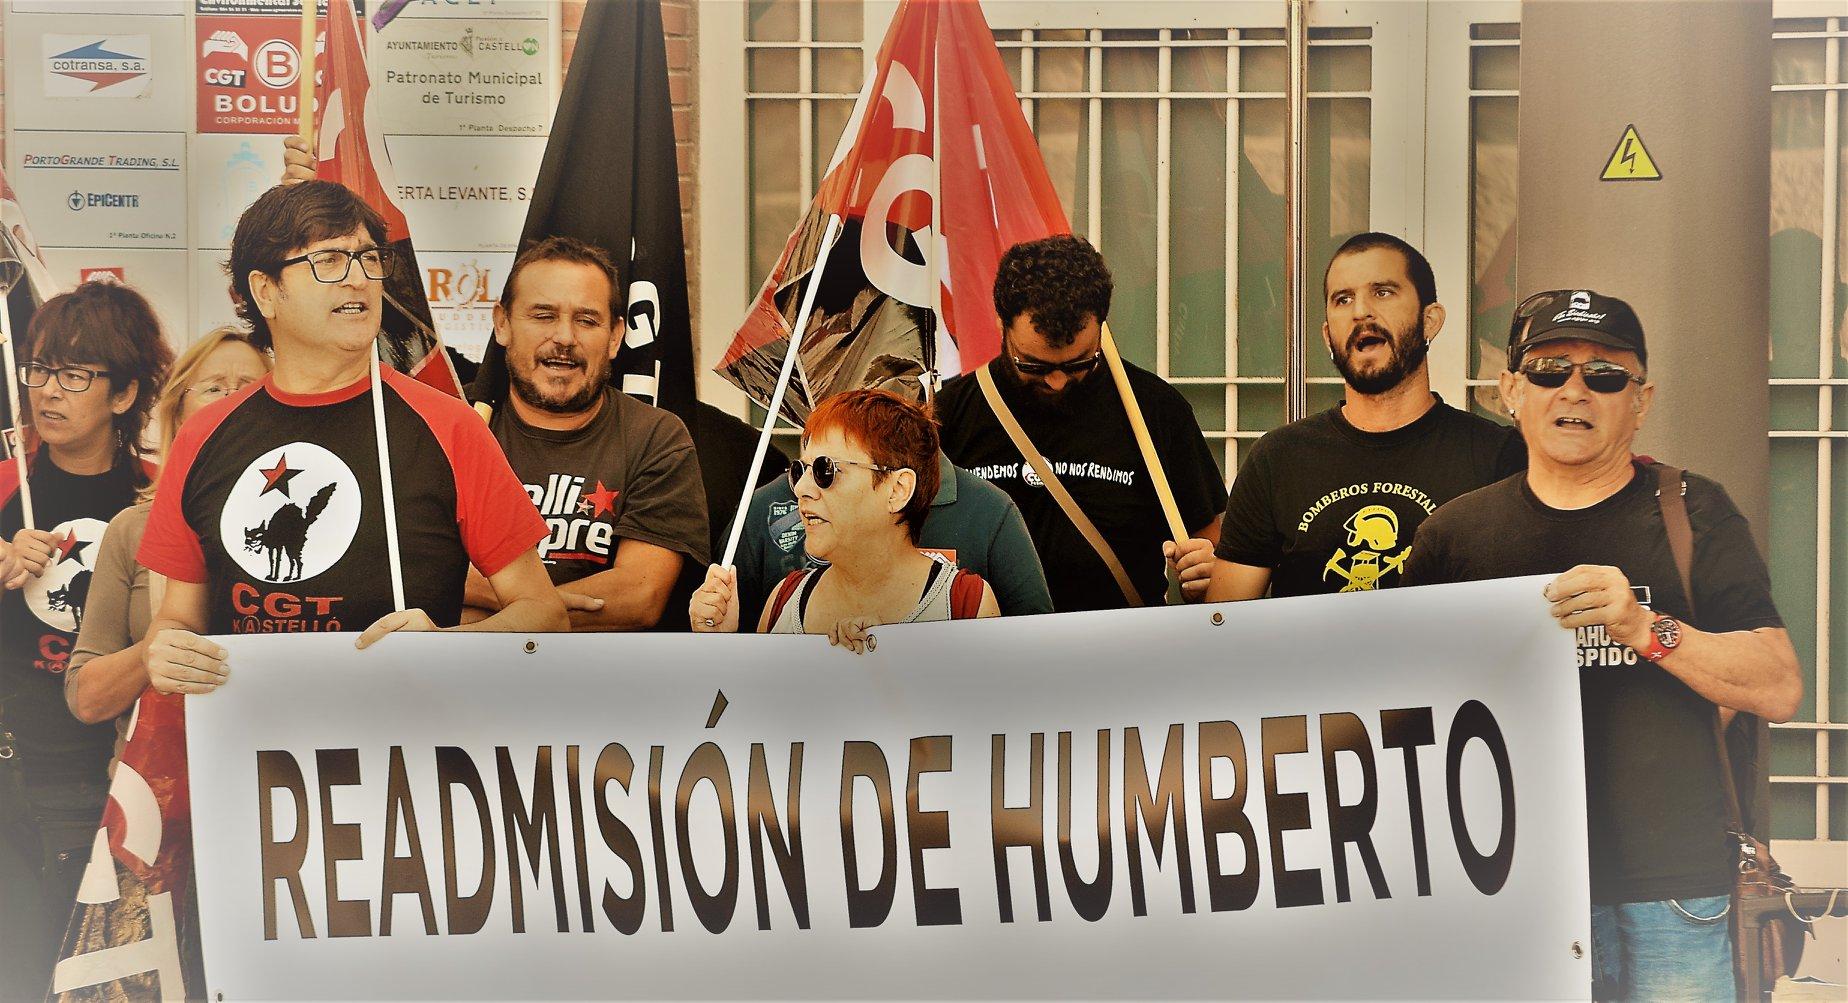 Humberto Readmisión 1